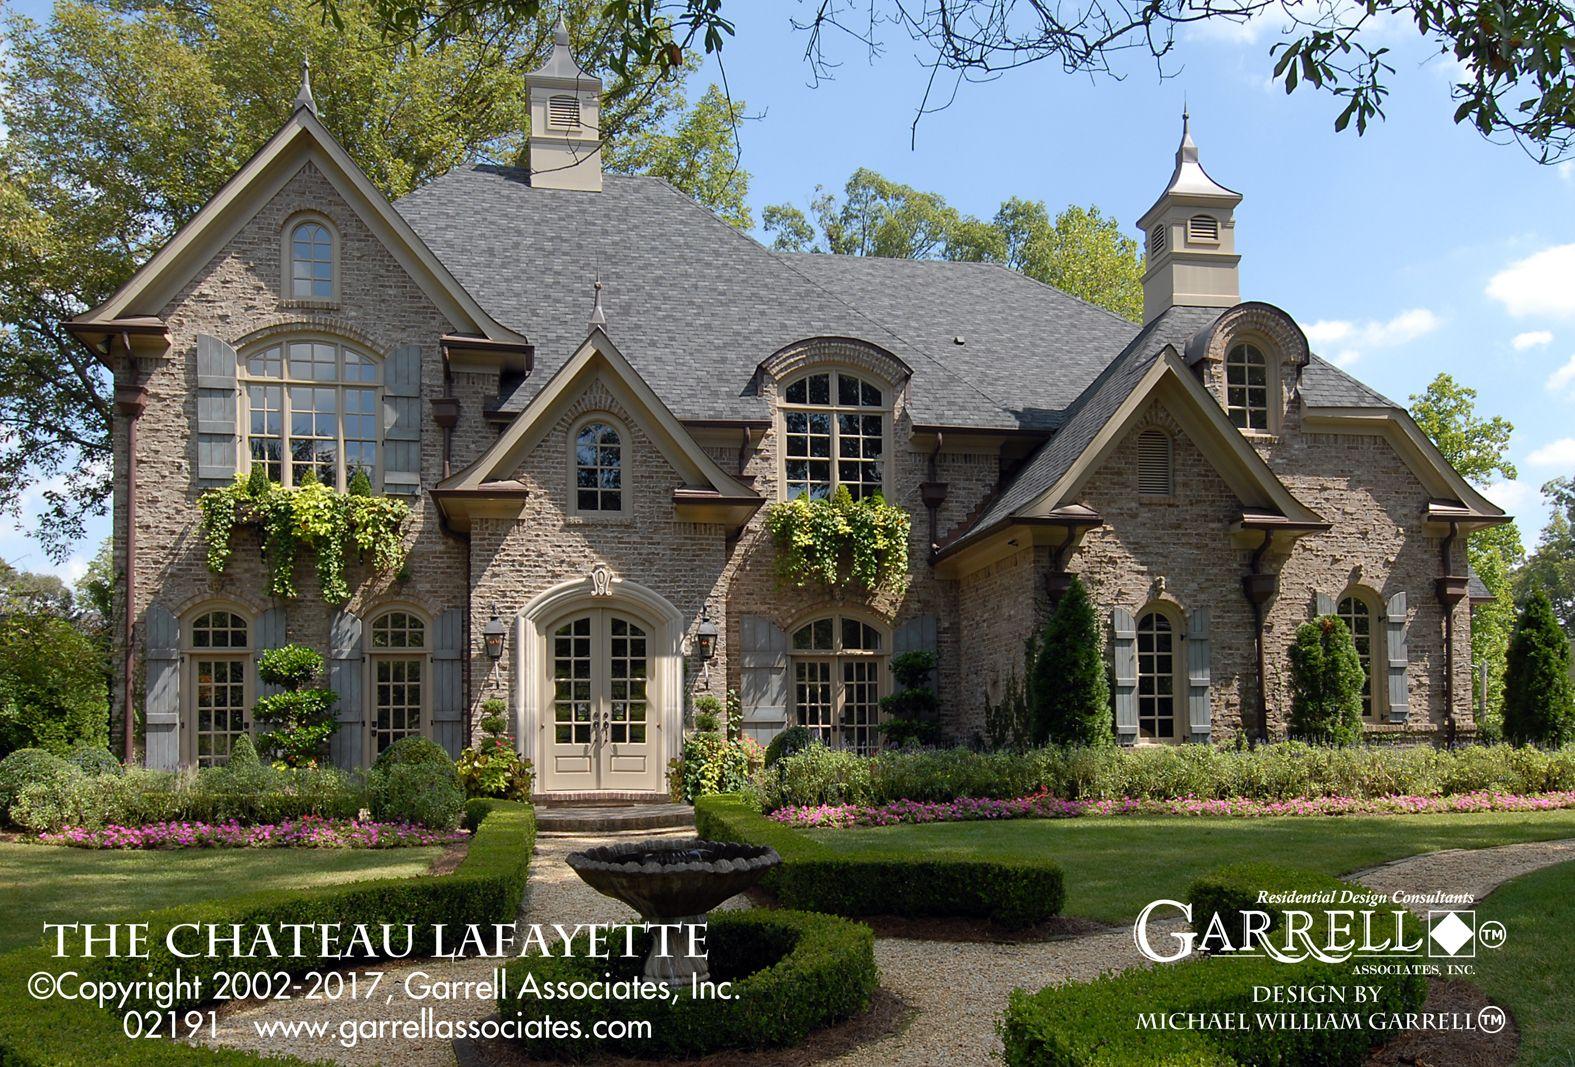 Chateau Lafayette House Plan 02191 Garrell Associates Inc French Country House Plans French Country House Luxury House Plans